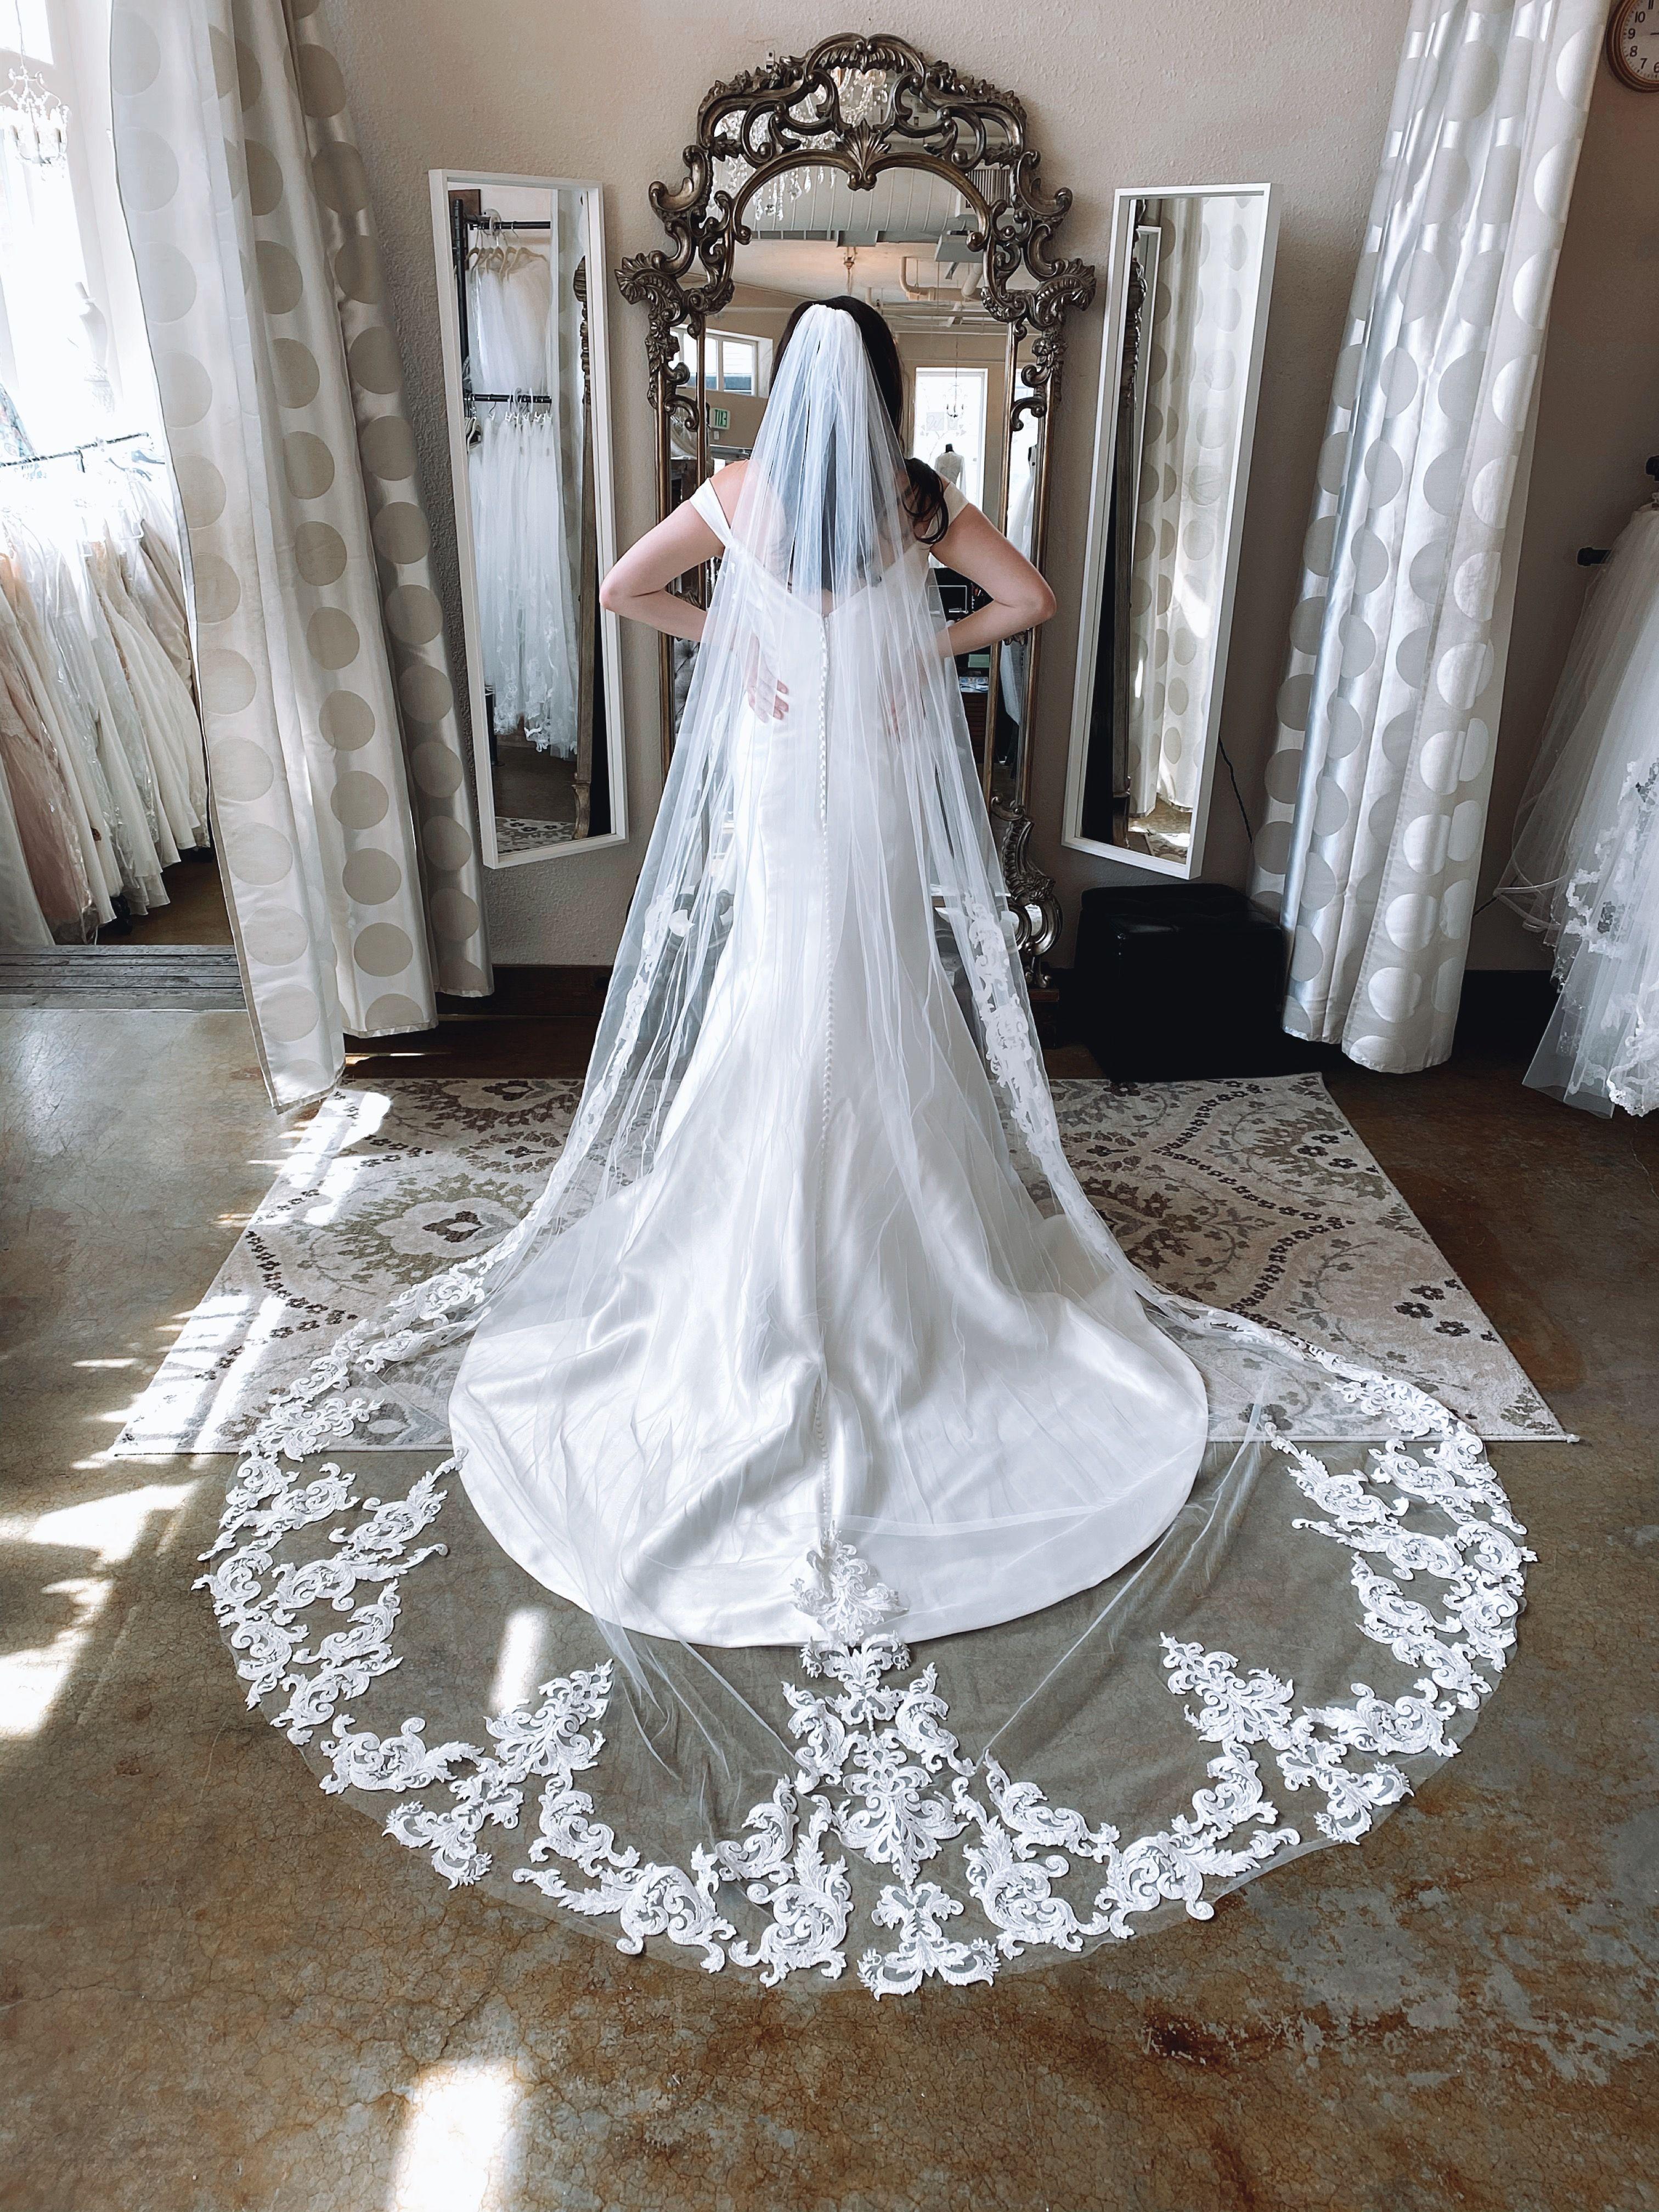 Tuscany Veil Wedding Dresses Designer Wedding Dresses Wedding [ 4032 x 3024 Pixel ]